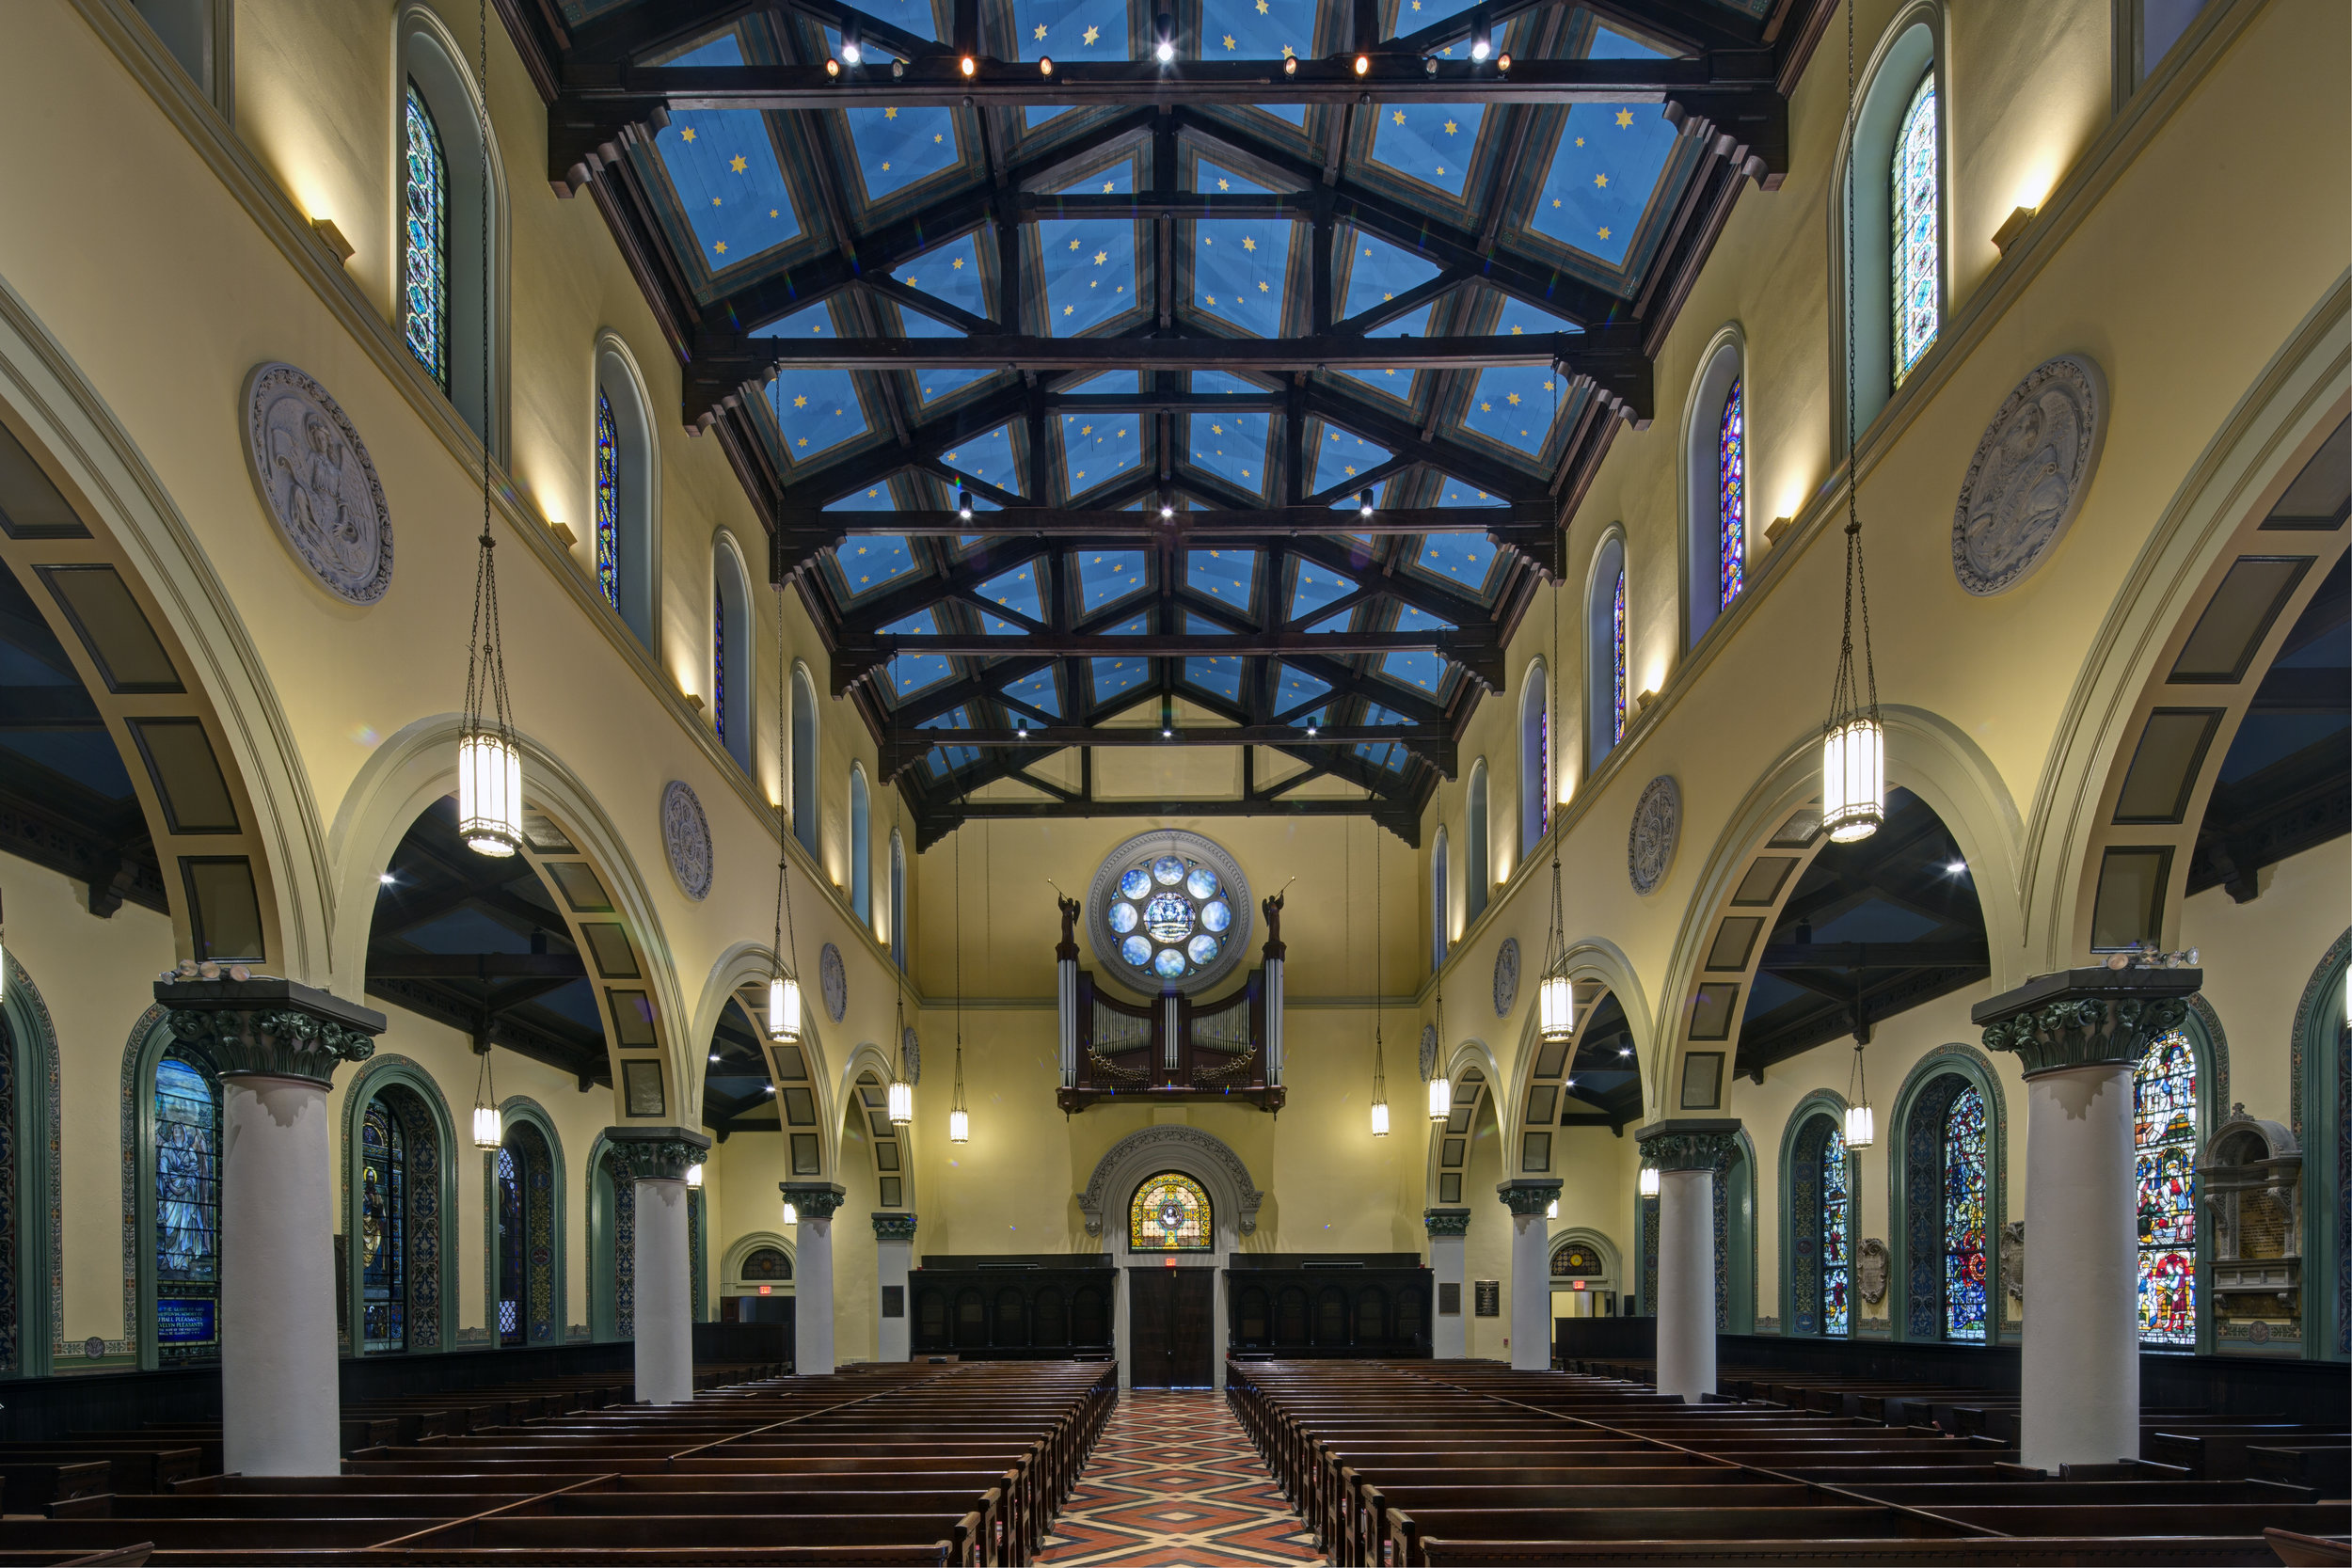 St. Paul's Episcopal Church, after renovation